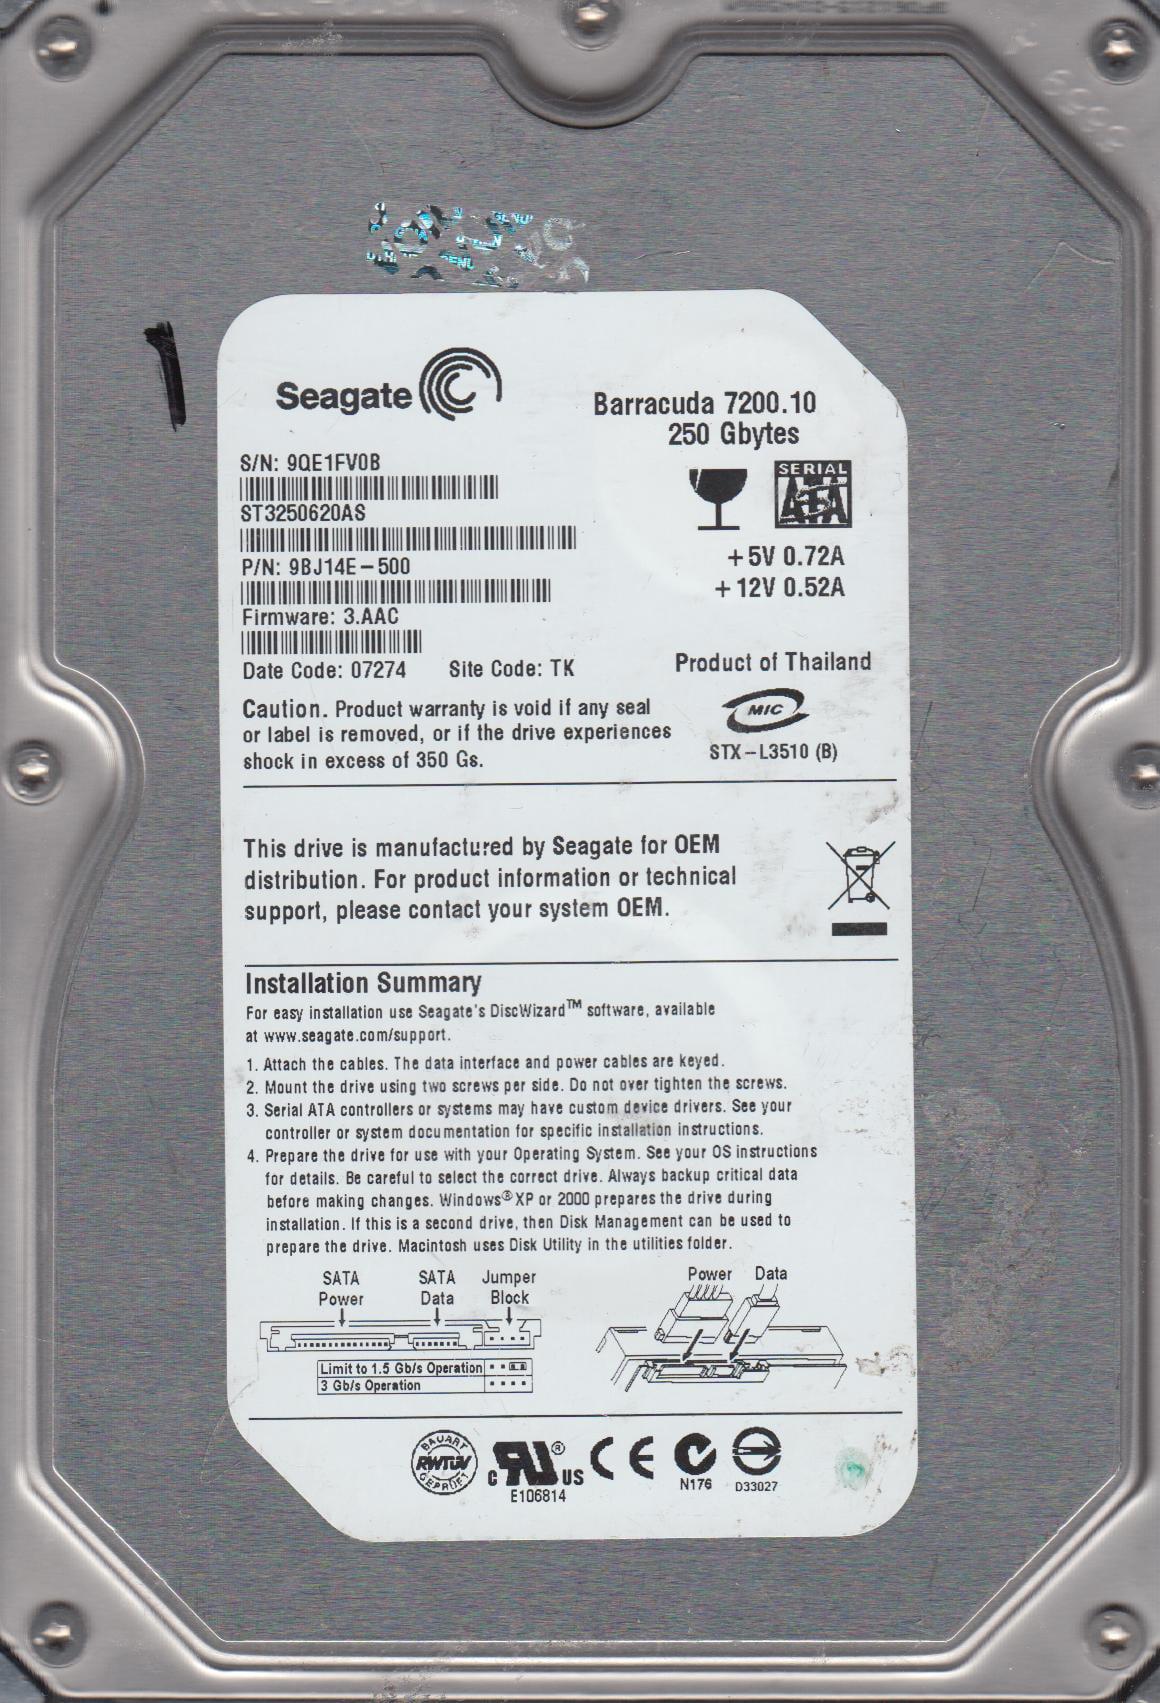 ST3250620AS, 9QE, TK, PN 9BJ14E-500, FW 3.AAC, Seagate 250GB SATA 3.5 Hard Drive by Seagate